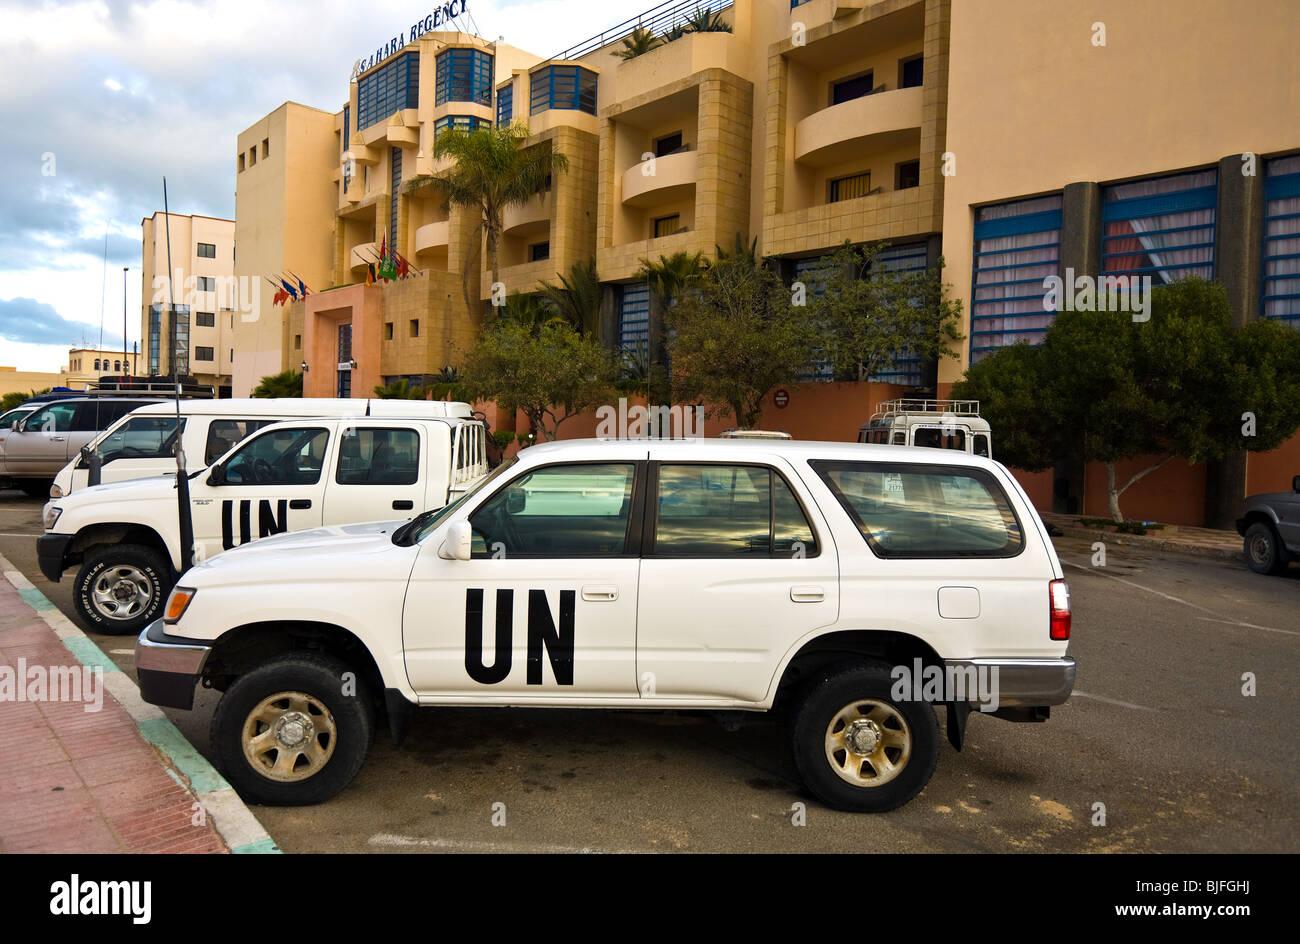 Western Sahara, Dakhla. UN vehicles, Sahara Regency Hotel. - Stock Image